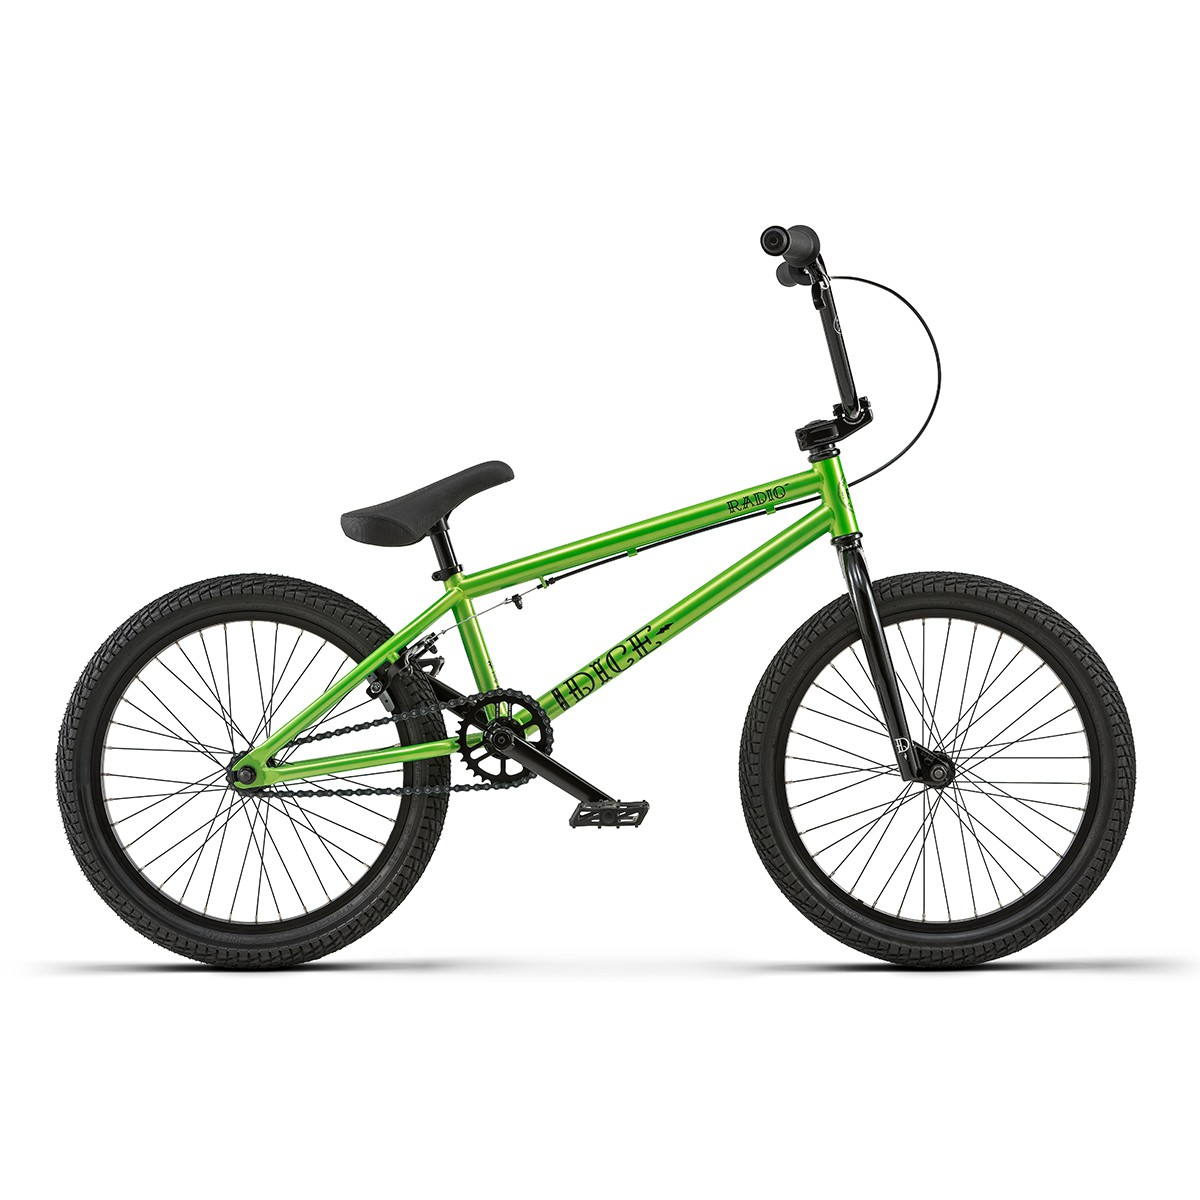 "BMX RADIO BIKE DICE 20"" METALLIC GREEN 2018"